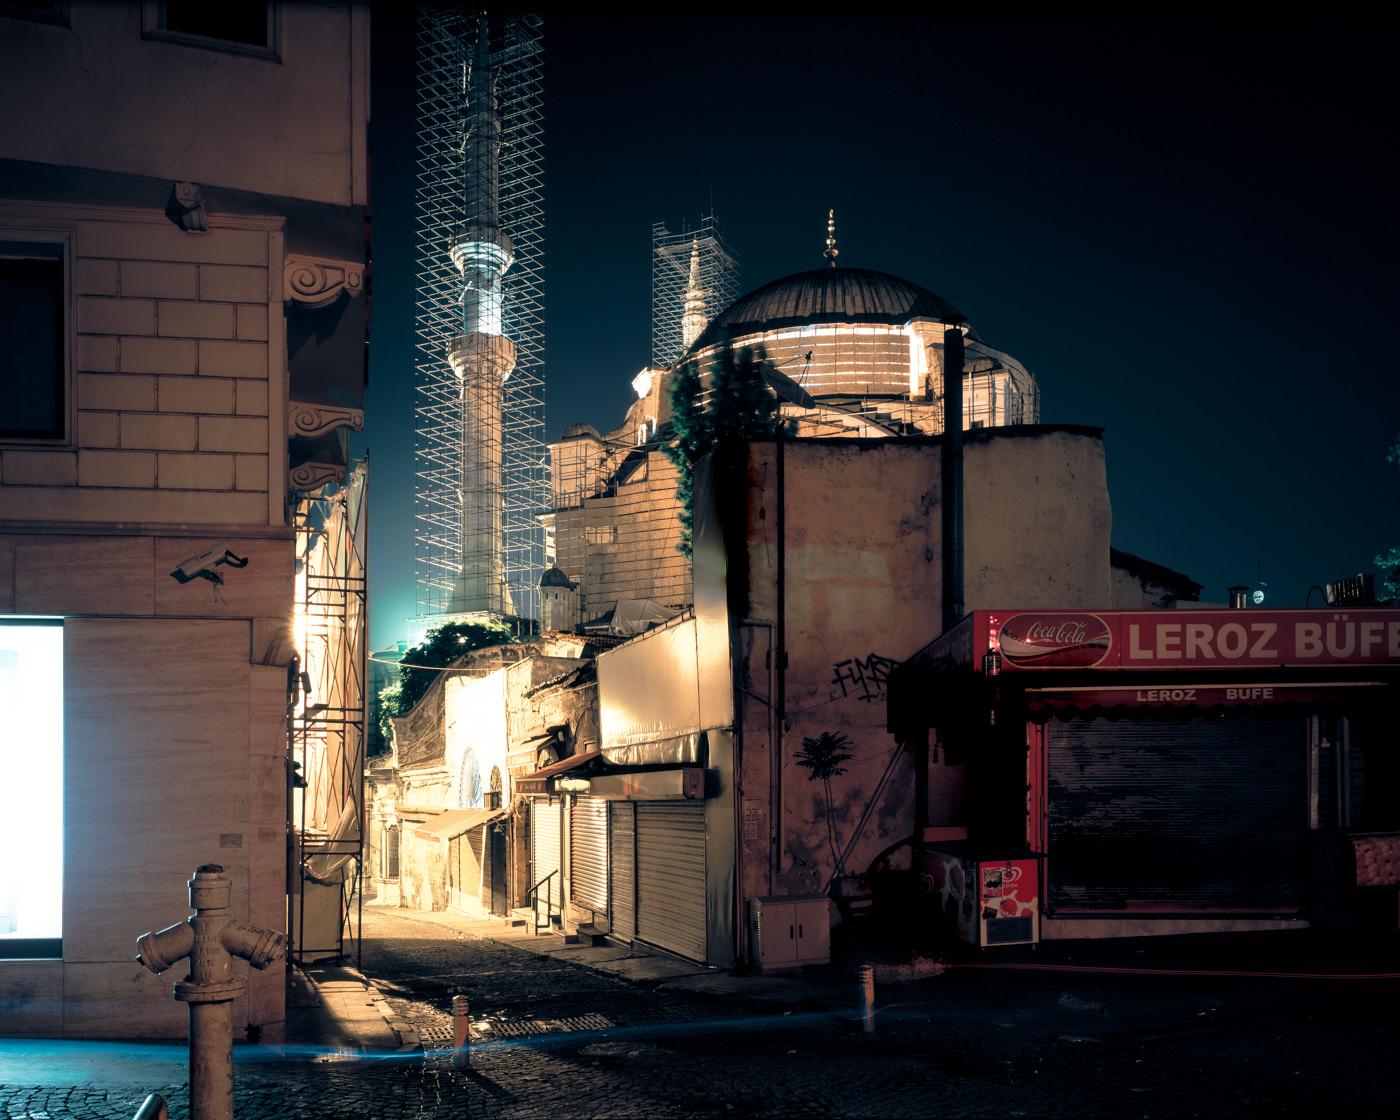 """Nuruosmaniye Mosque, Istanbul"" from the series Nylon Chrysalis, by William Mokrynski"